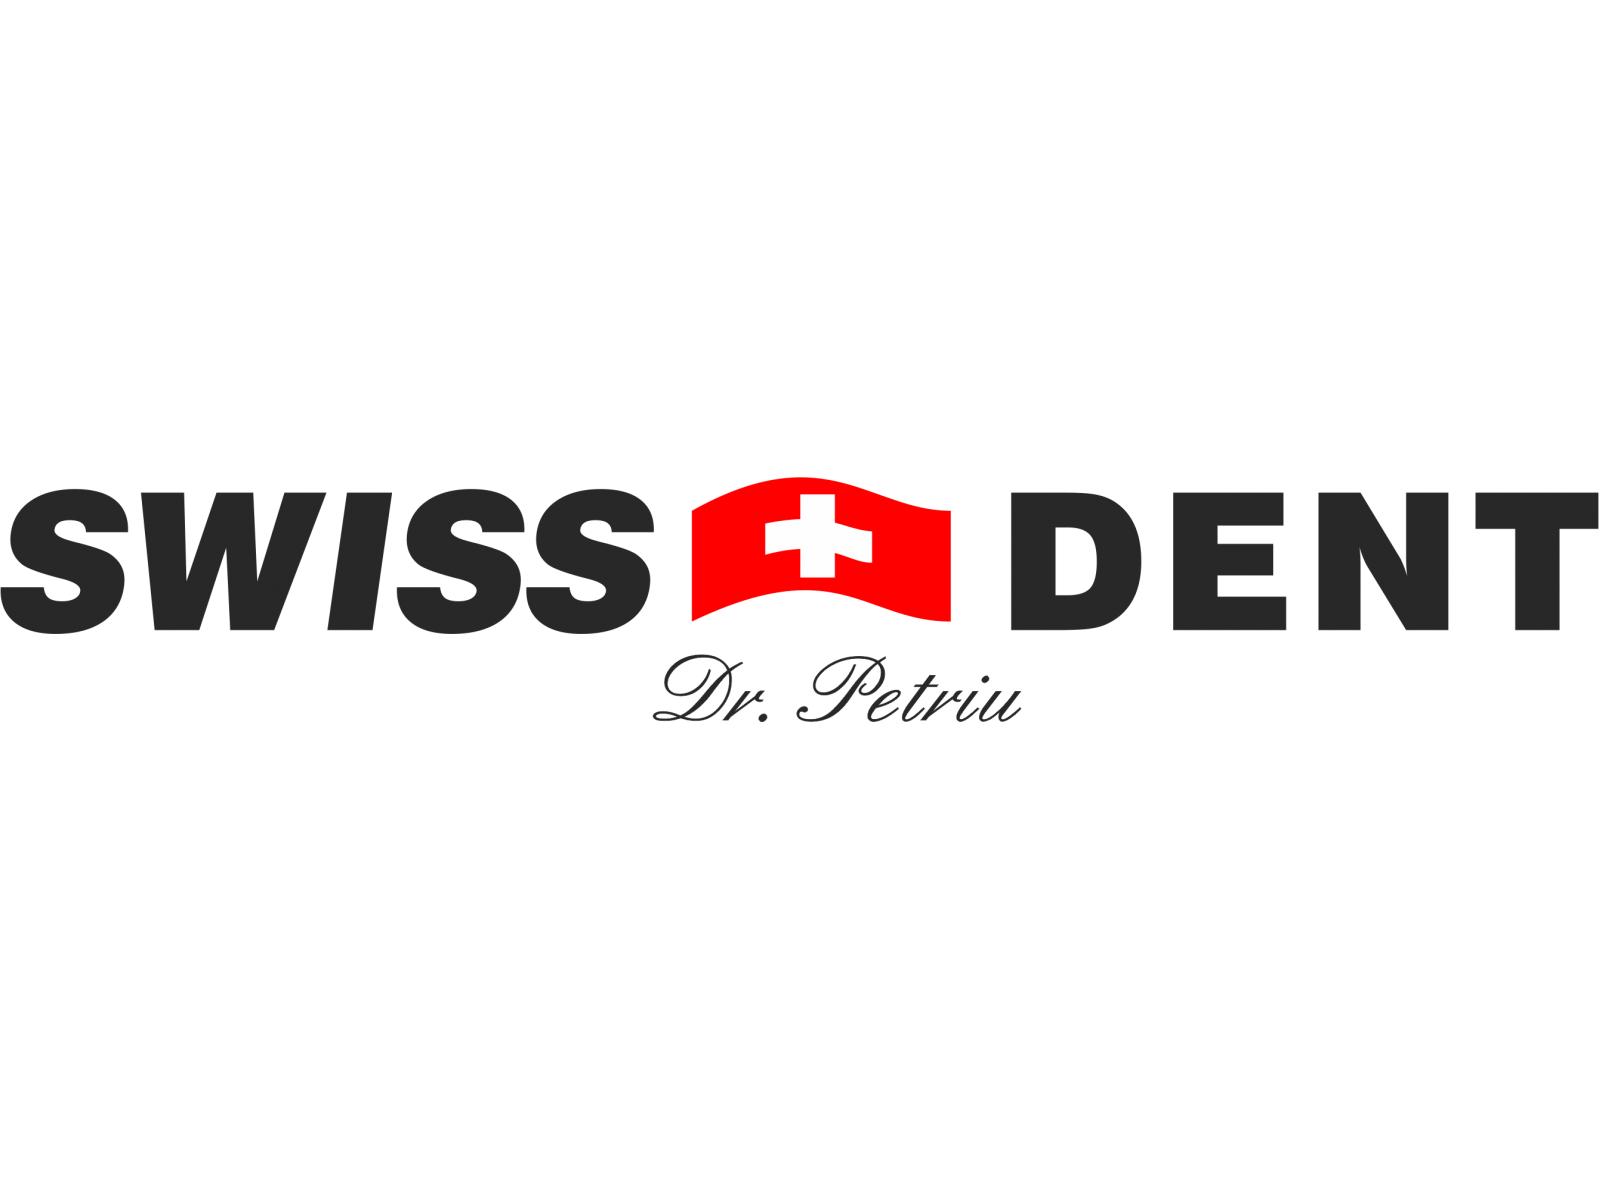 SWISSDENT Dr. Petriu - swissdent_clinica.png